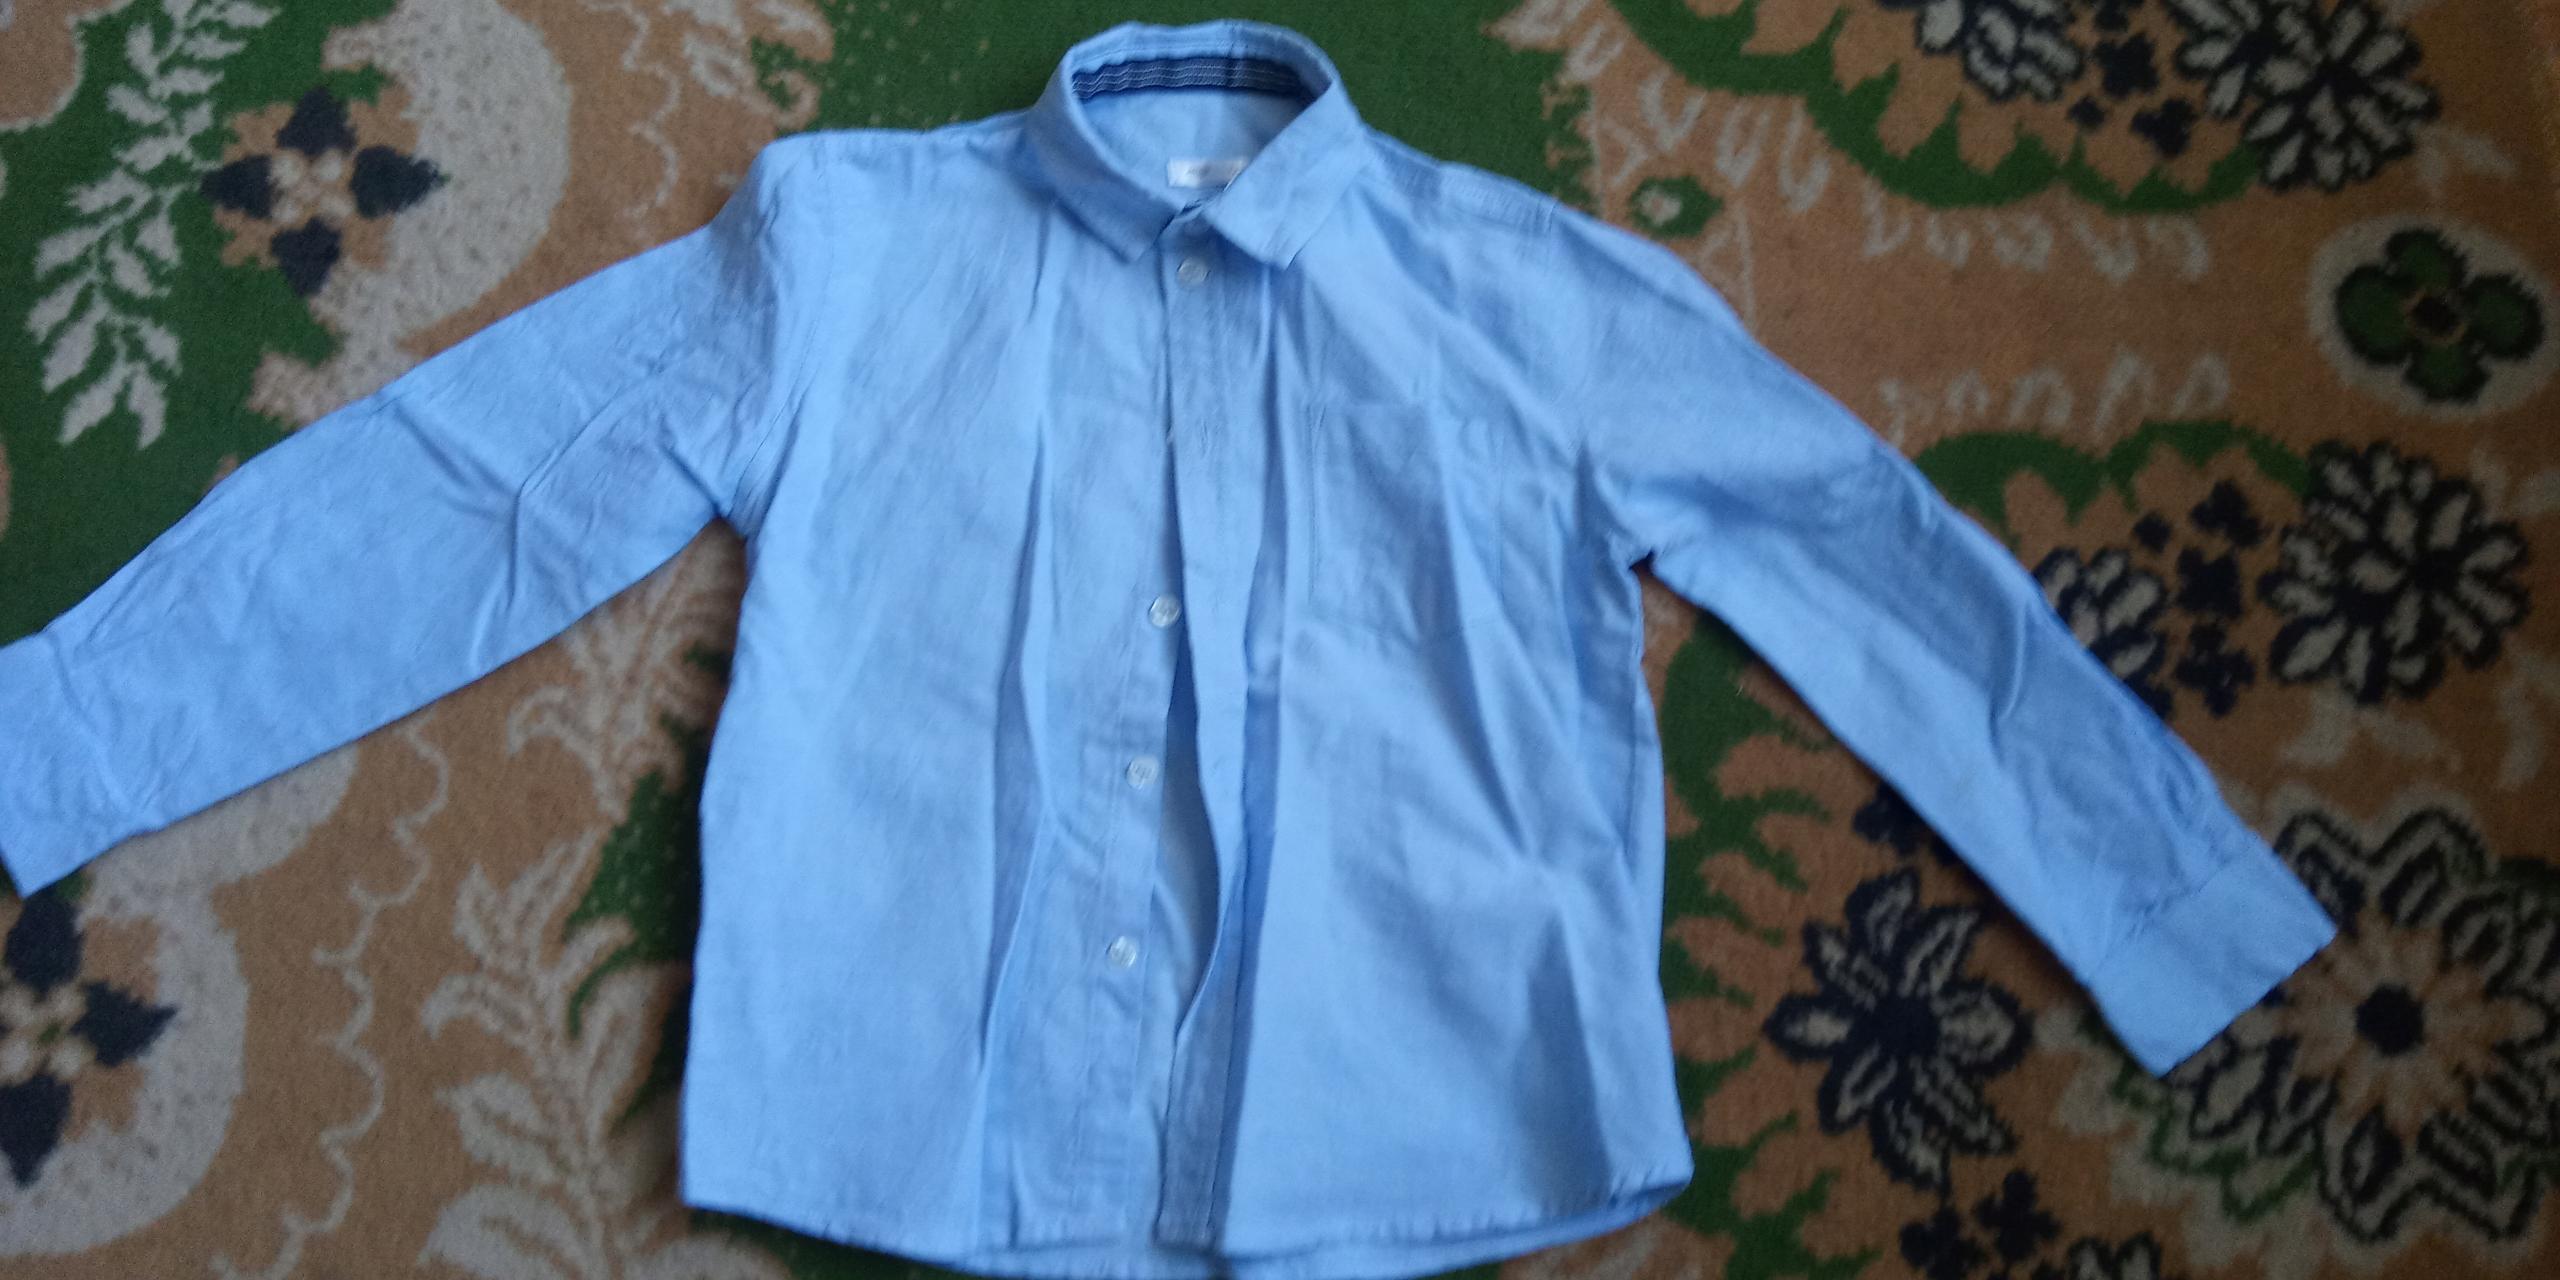 Koszula niebieska r. 122 chłopak 6 lat